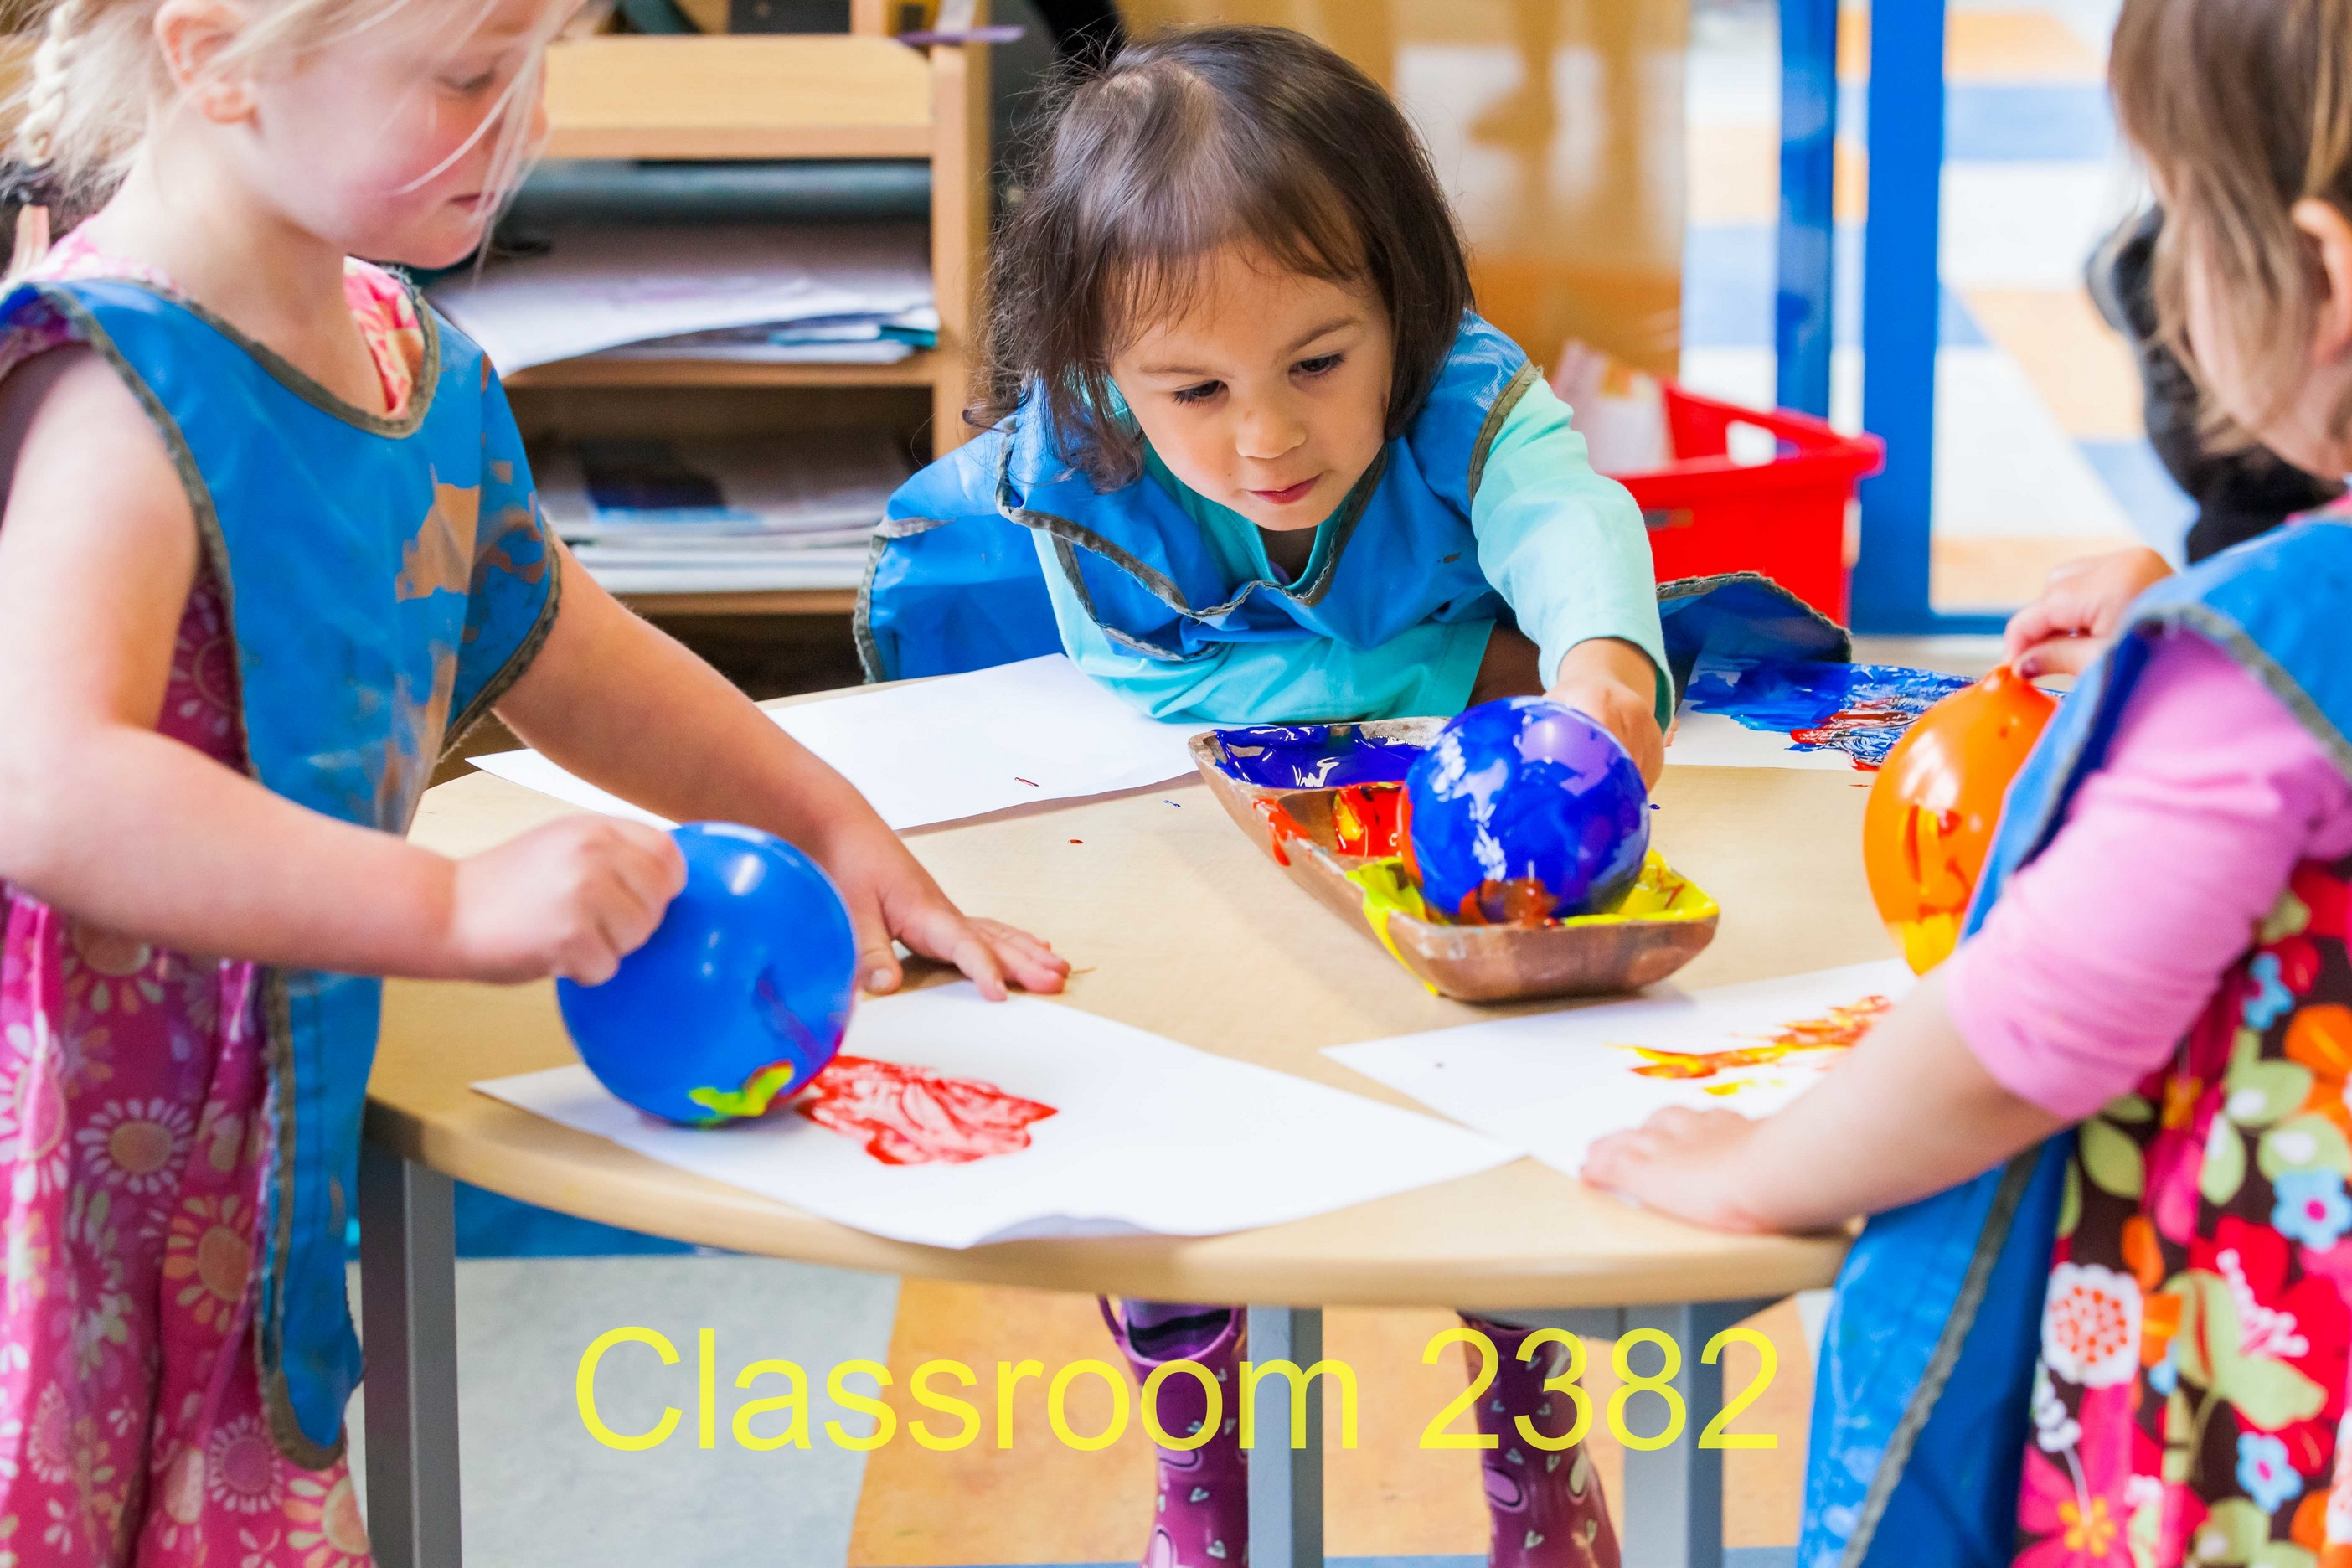 Classroom 2382